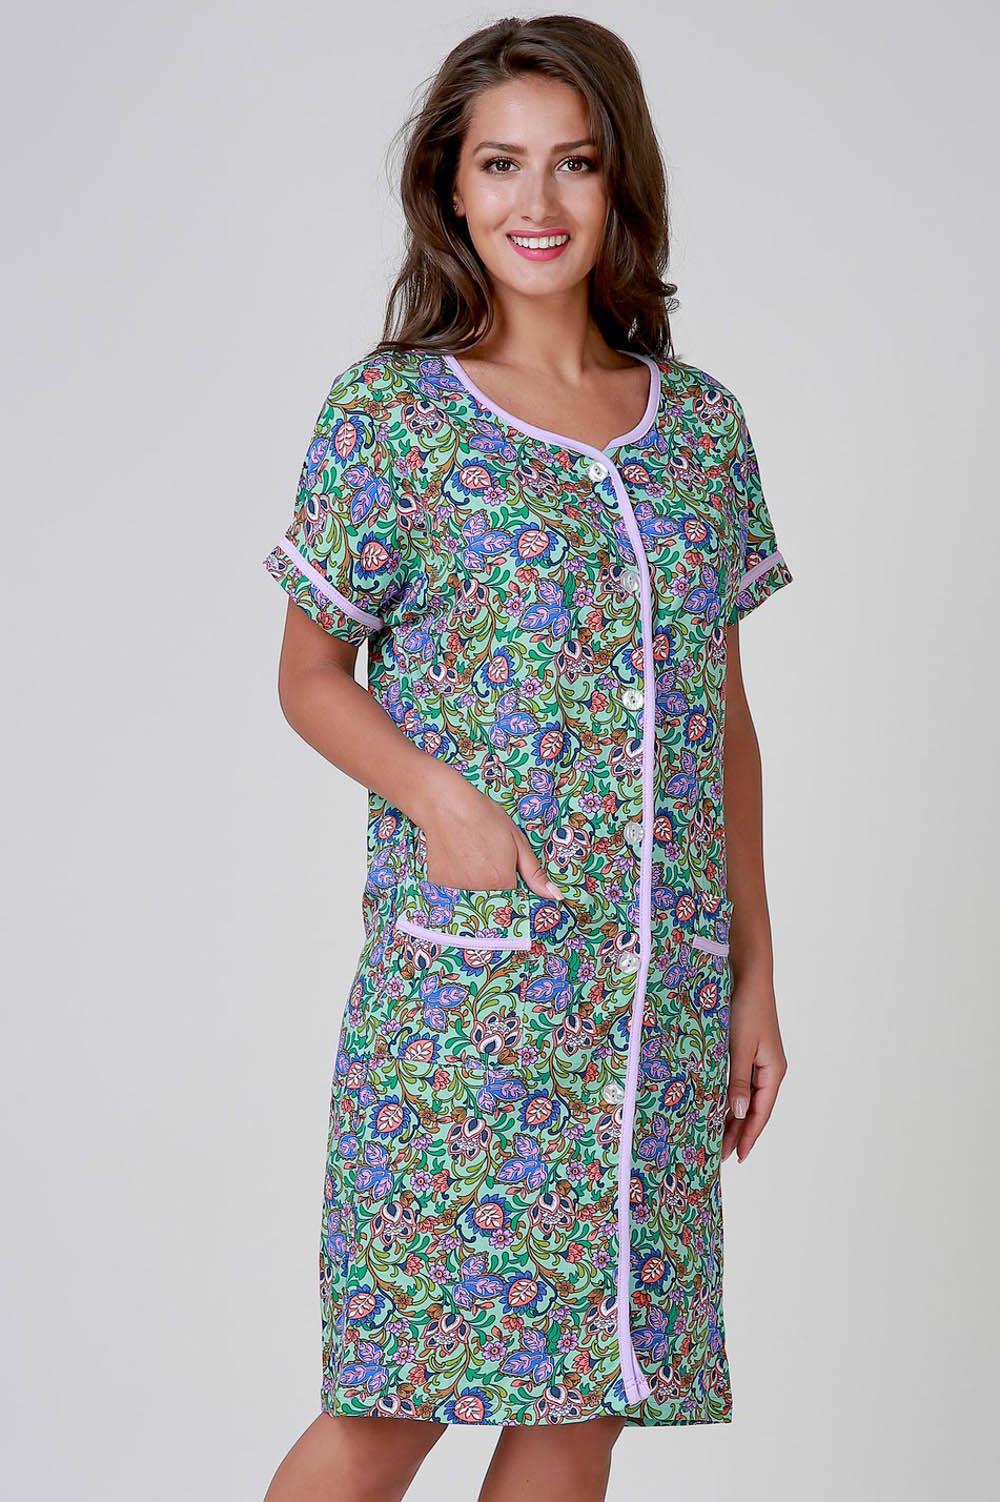 Домашние халаты Pastilla Домашний халат Лаванда (xxL) халаты банные lelio халат